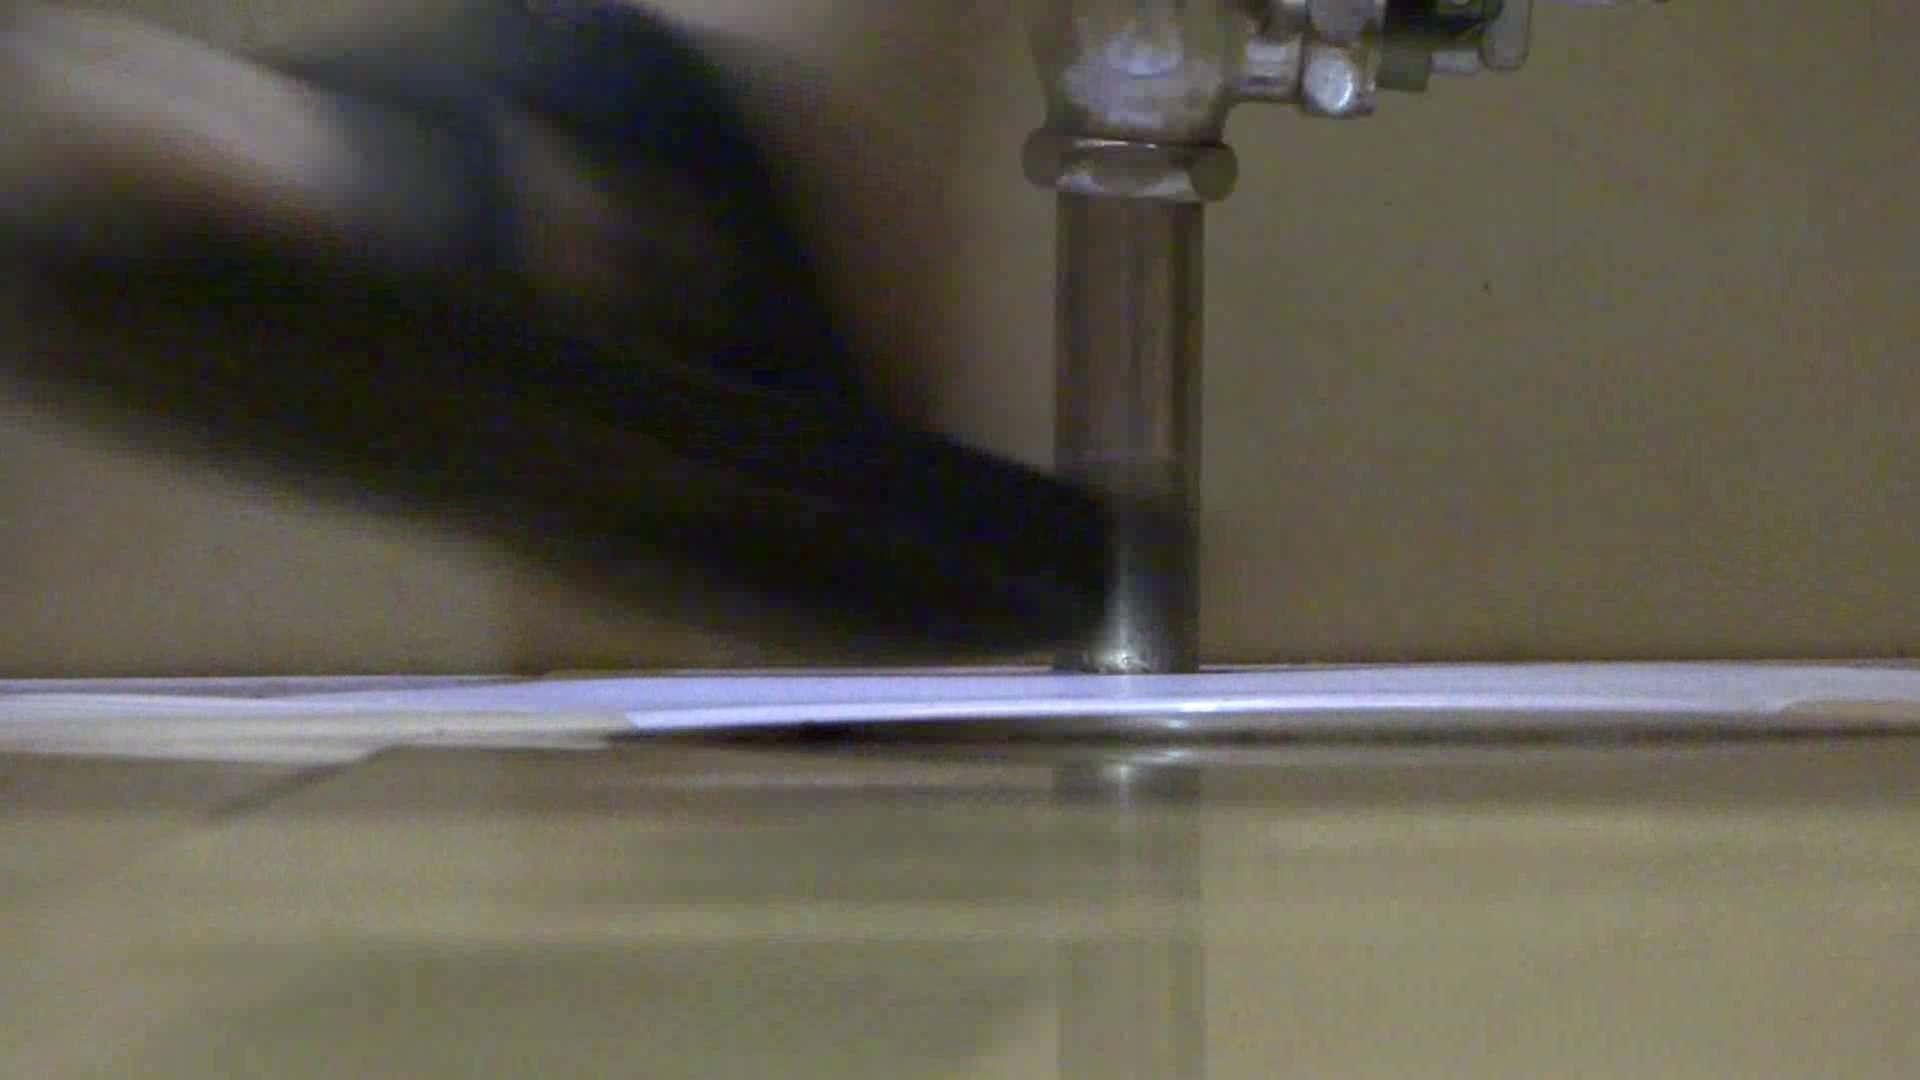 隣国化粧室下から御免!! No.15 洗面所 | 美女H映像  103画像 103